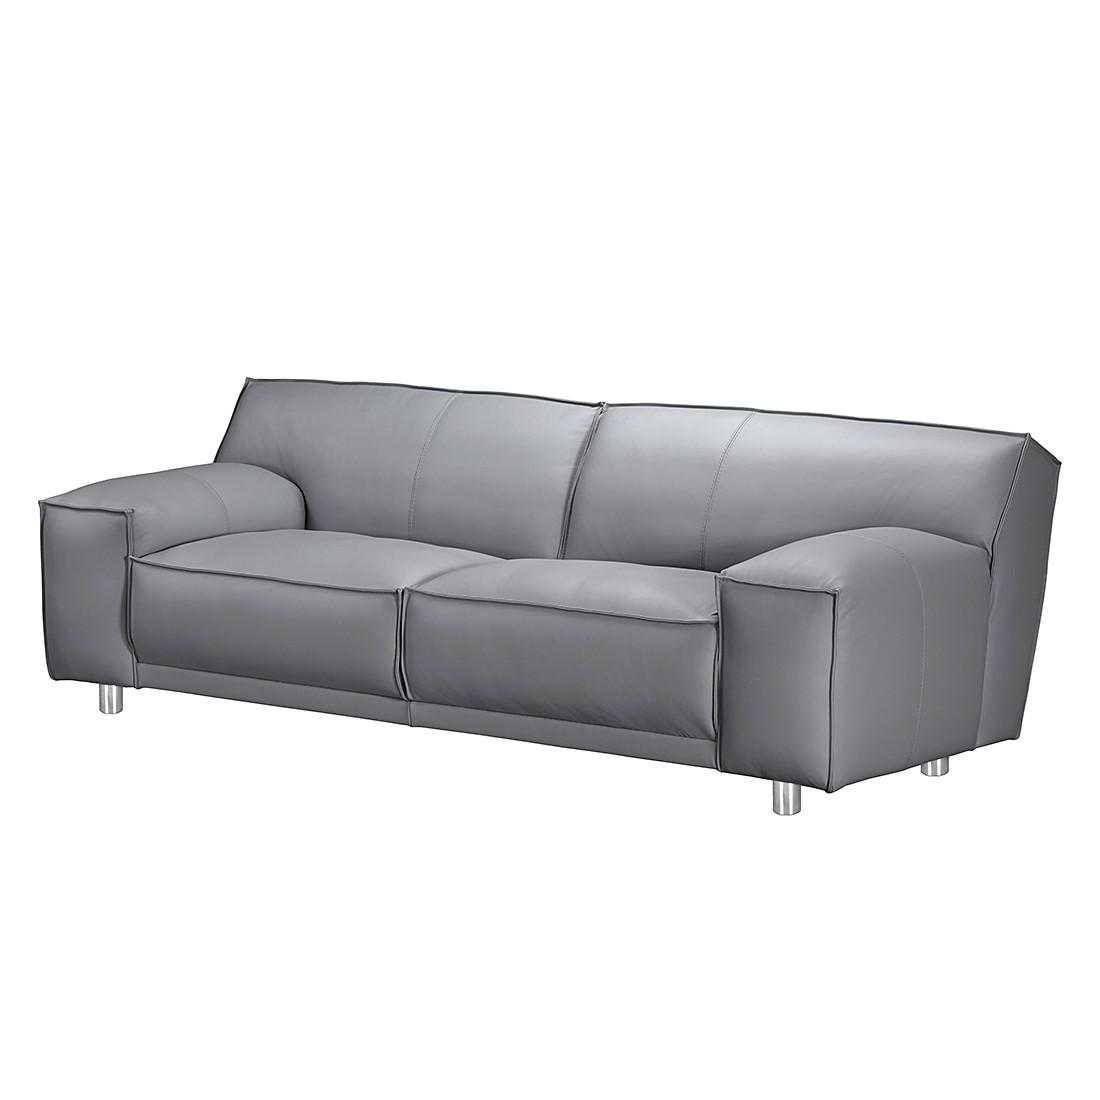 Sofa Willem (2,5-Sitzer) – Kunstleder Grau, loftscape kaufen